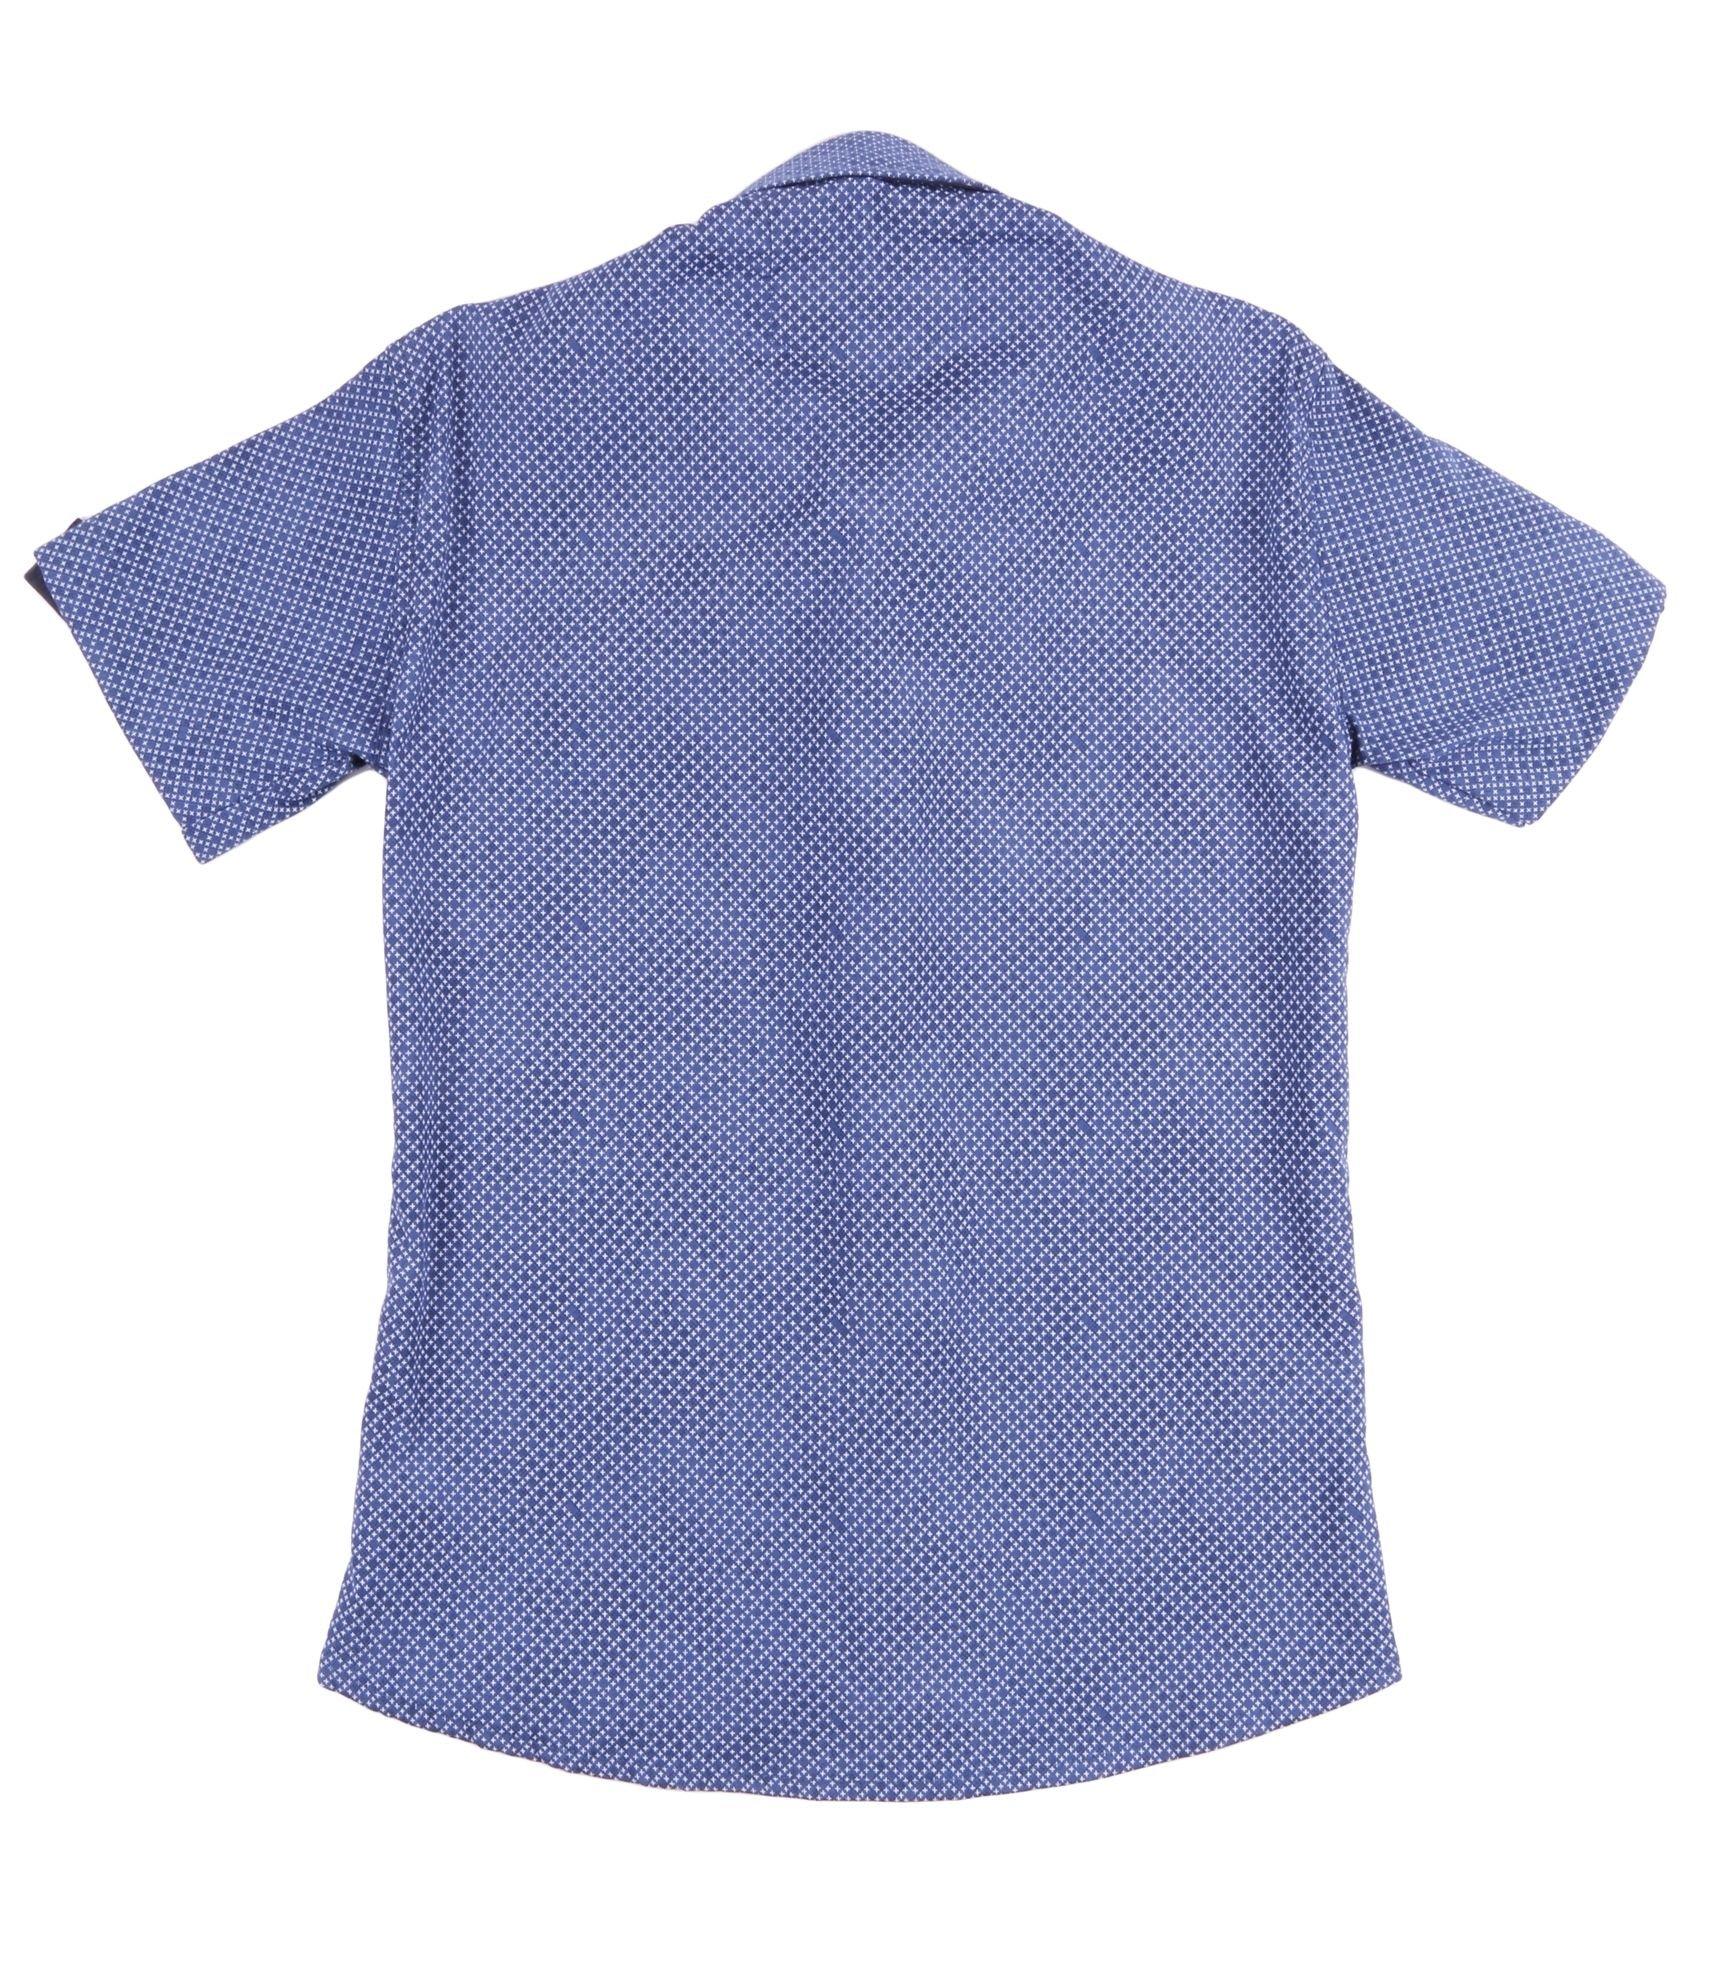 Детская рубашка с коротким рукавом (Арт. ТВ 2232К)